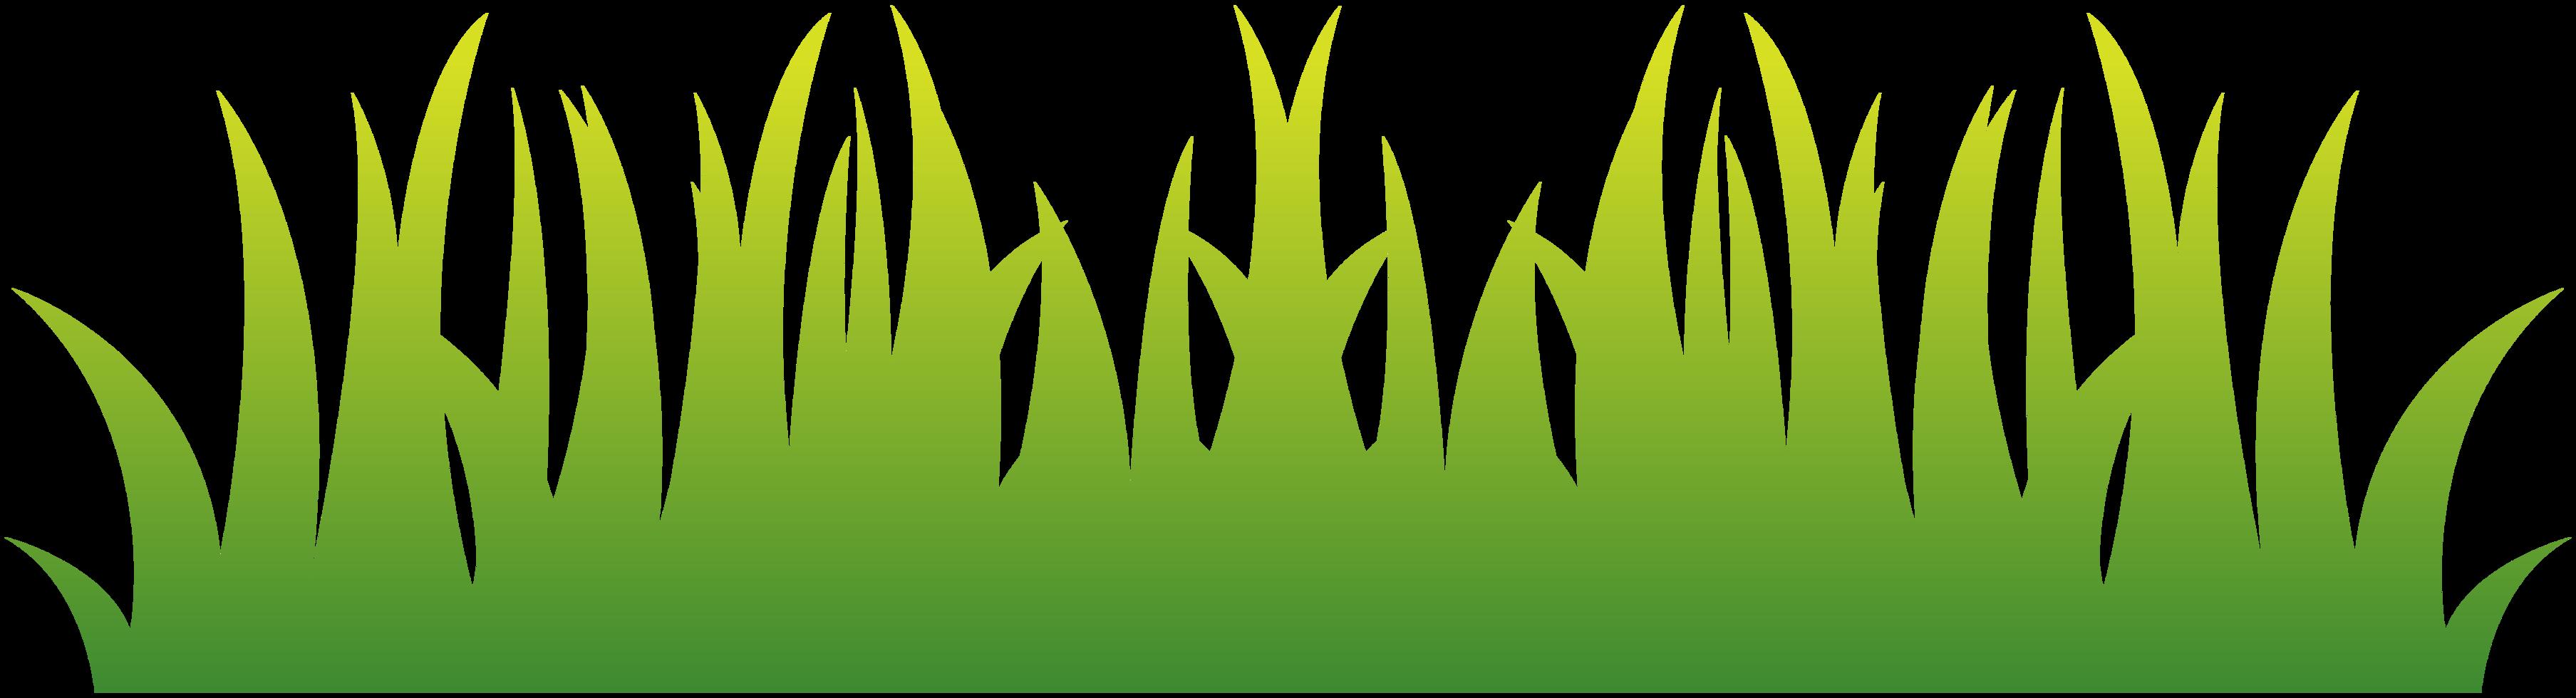 Gras png